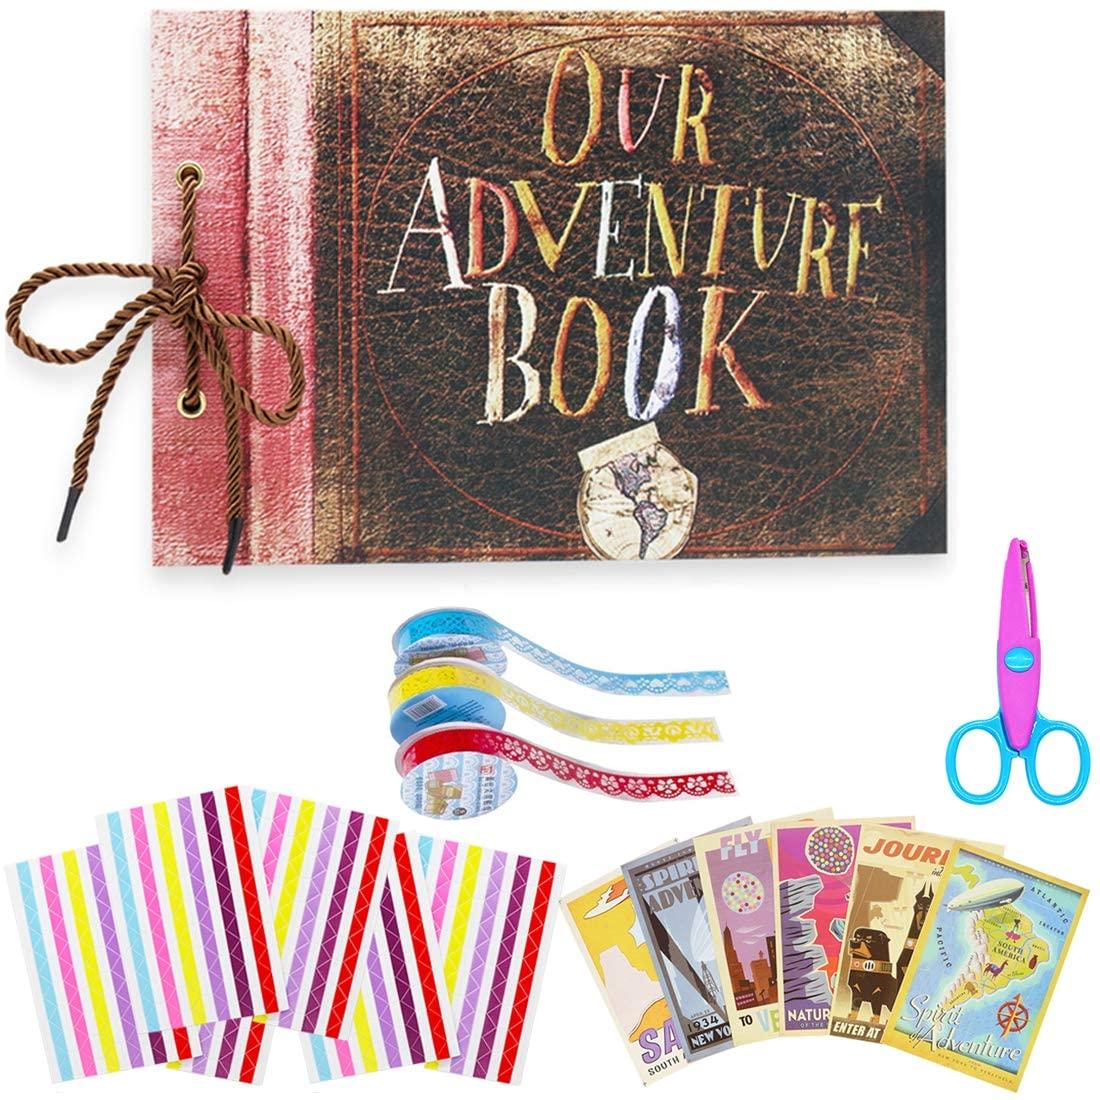 Big Trend Photo Album Scrapbook, Our Adventure Book, DIY Handmade Photo Album Scrapbook, Travel Scrapbook for Anniversary, Wedding, Trip, Baby Shower, etc. (Travel Scrapbook)